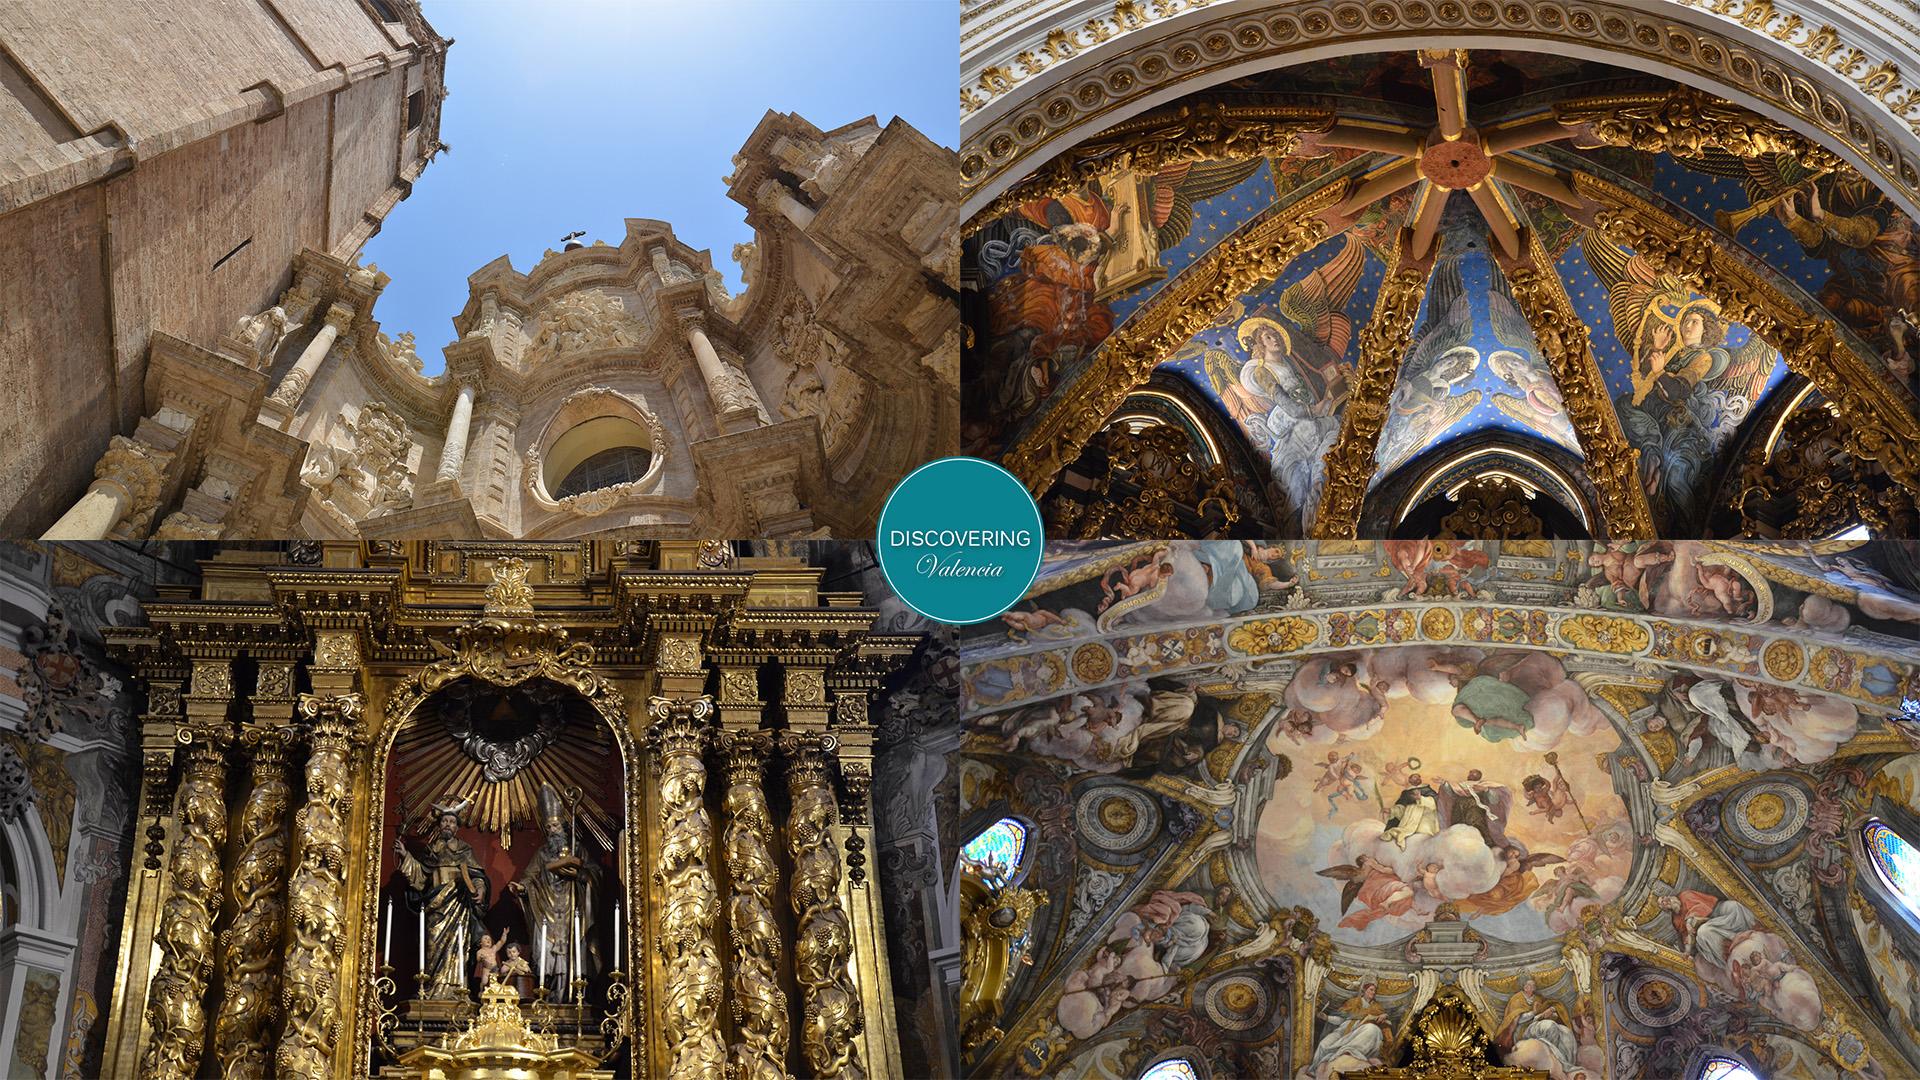 Nueva visita guiada Valencia - Catedral e Iglesia de San Nicolás